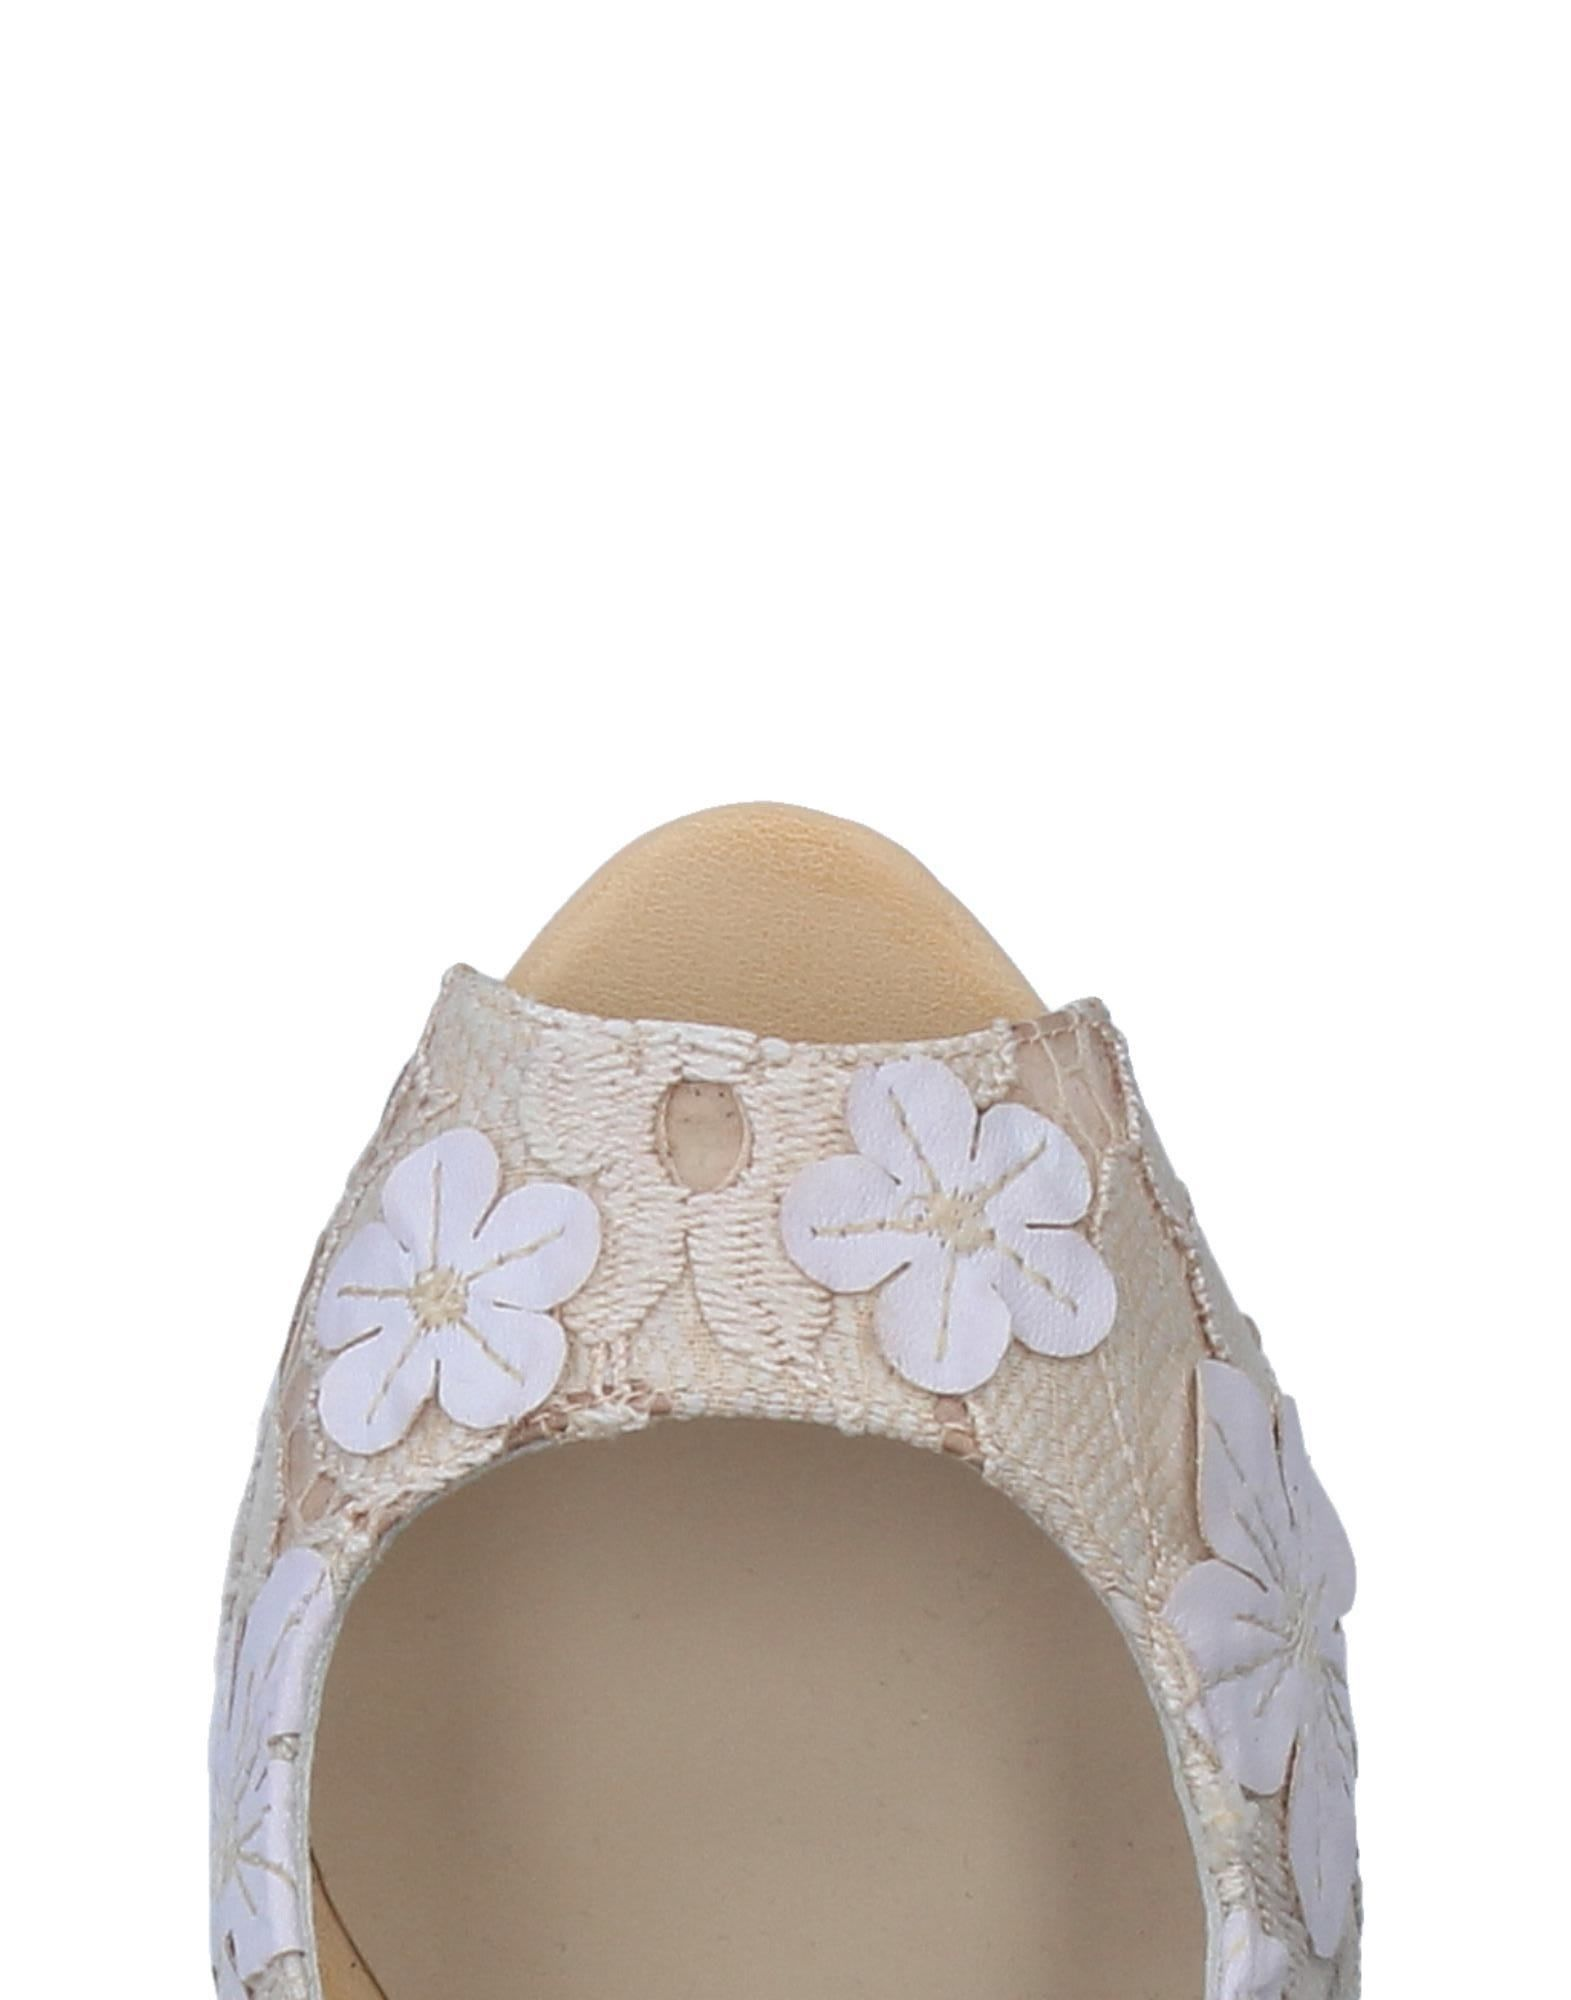 Sgn  Giancarlo Paoli Sandalen Damen  Sgn 11336904UD Gute Qualität beliebte Schuhe 38810c